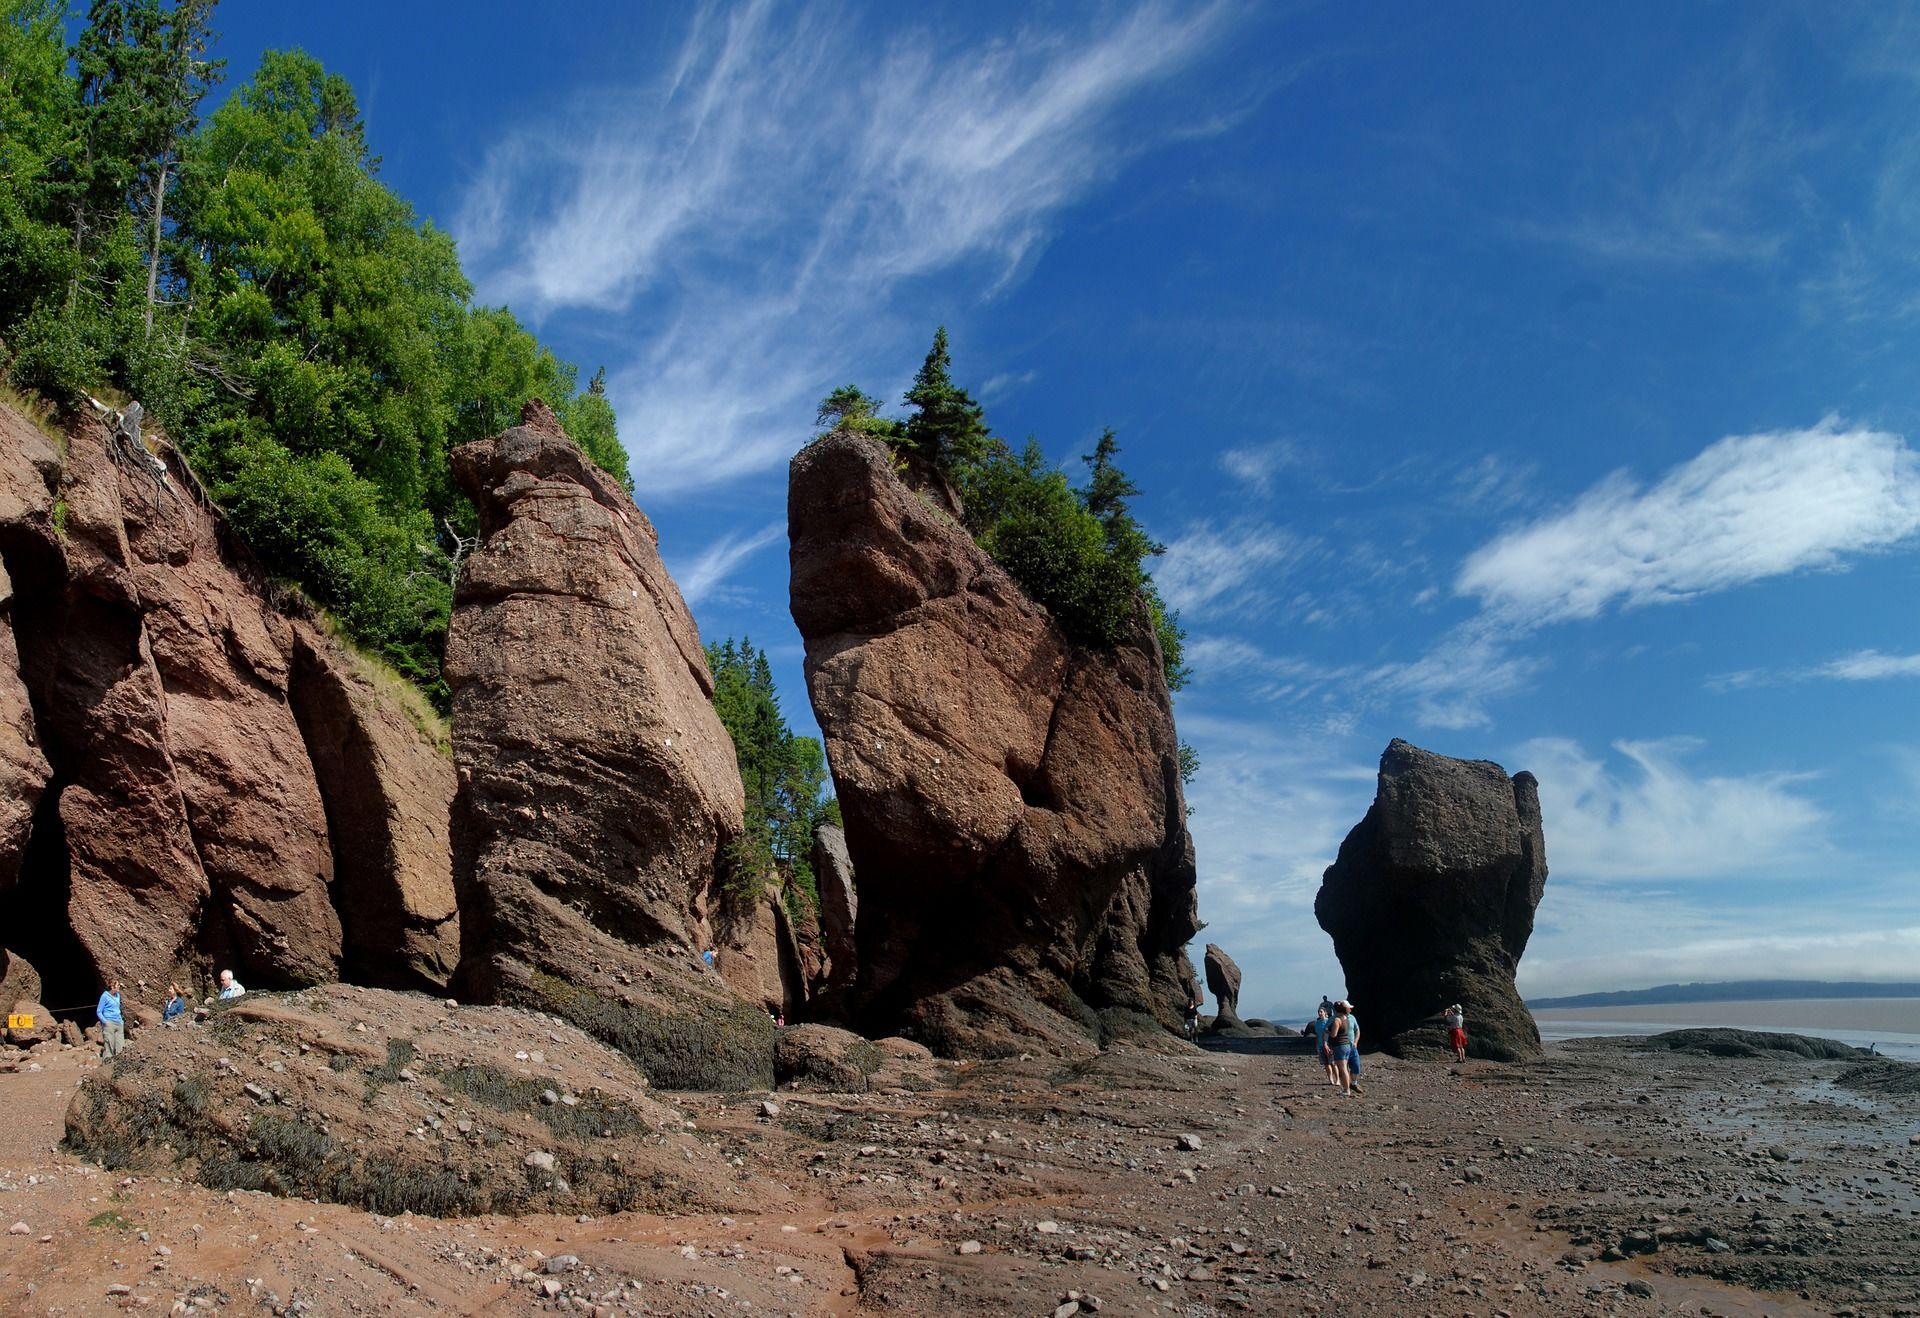 Atlantic-Canada-Hopewell-Rocks_1_527857 Canada